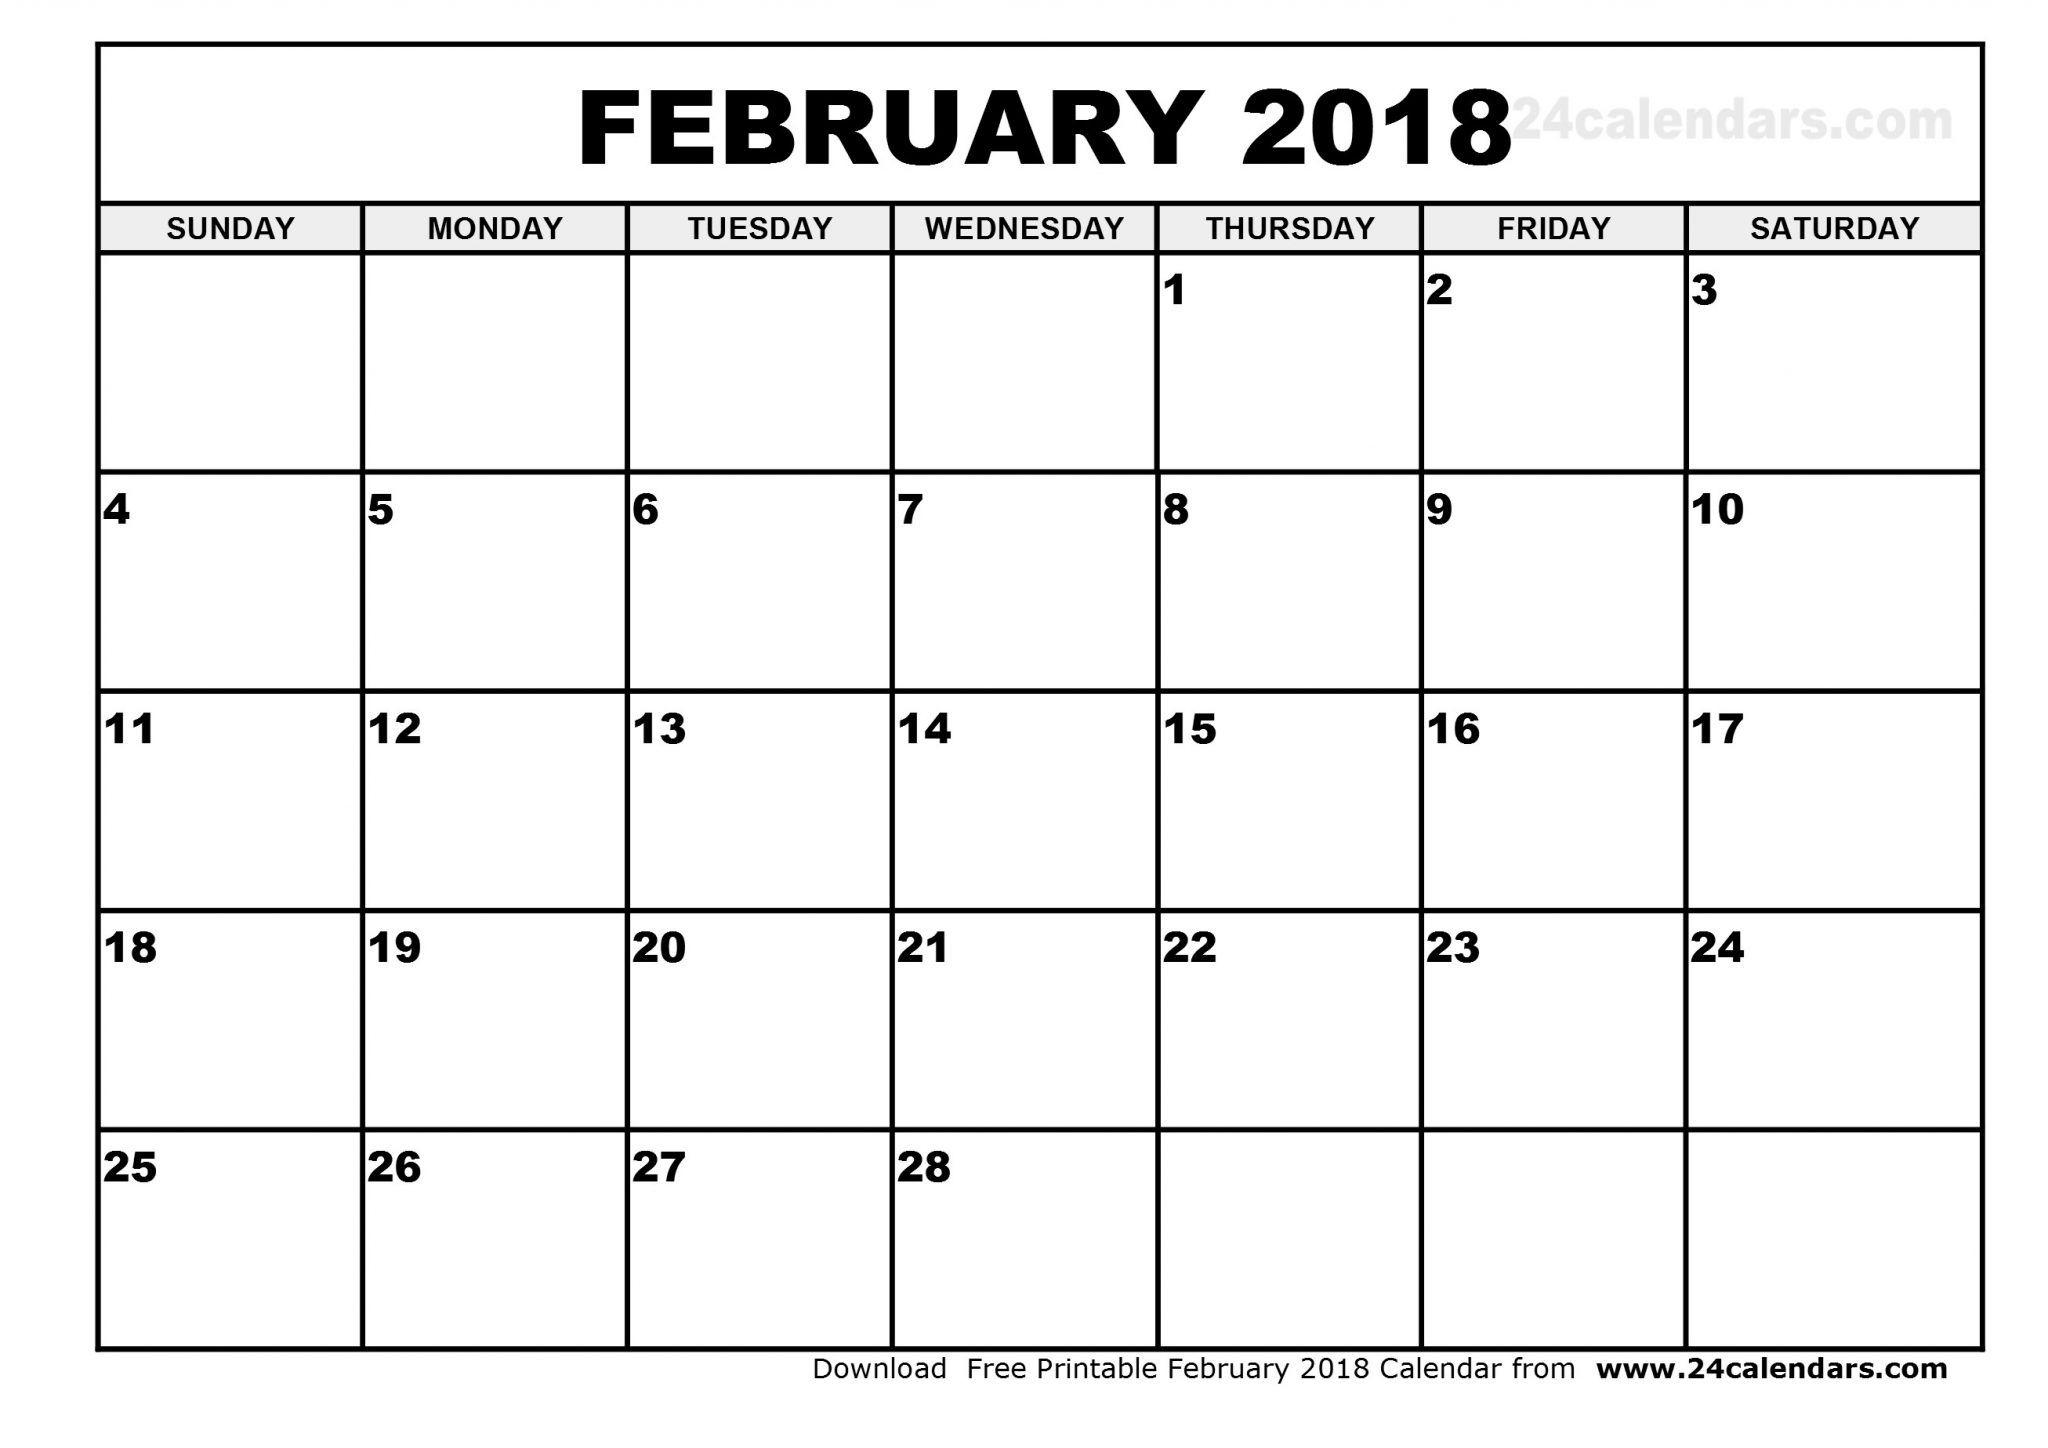 Blank February 2019 Calendar Printable | Free Printable February intended for A3 Blank Calendar Monthly Template